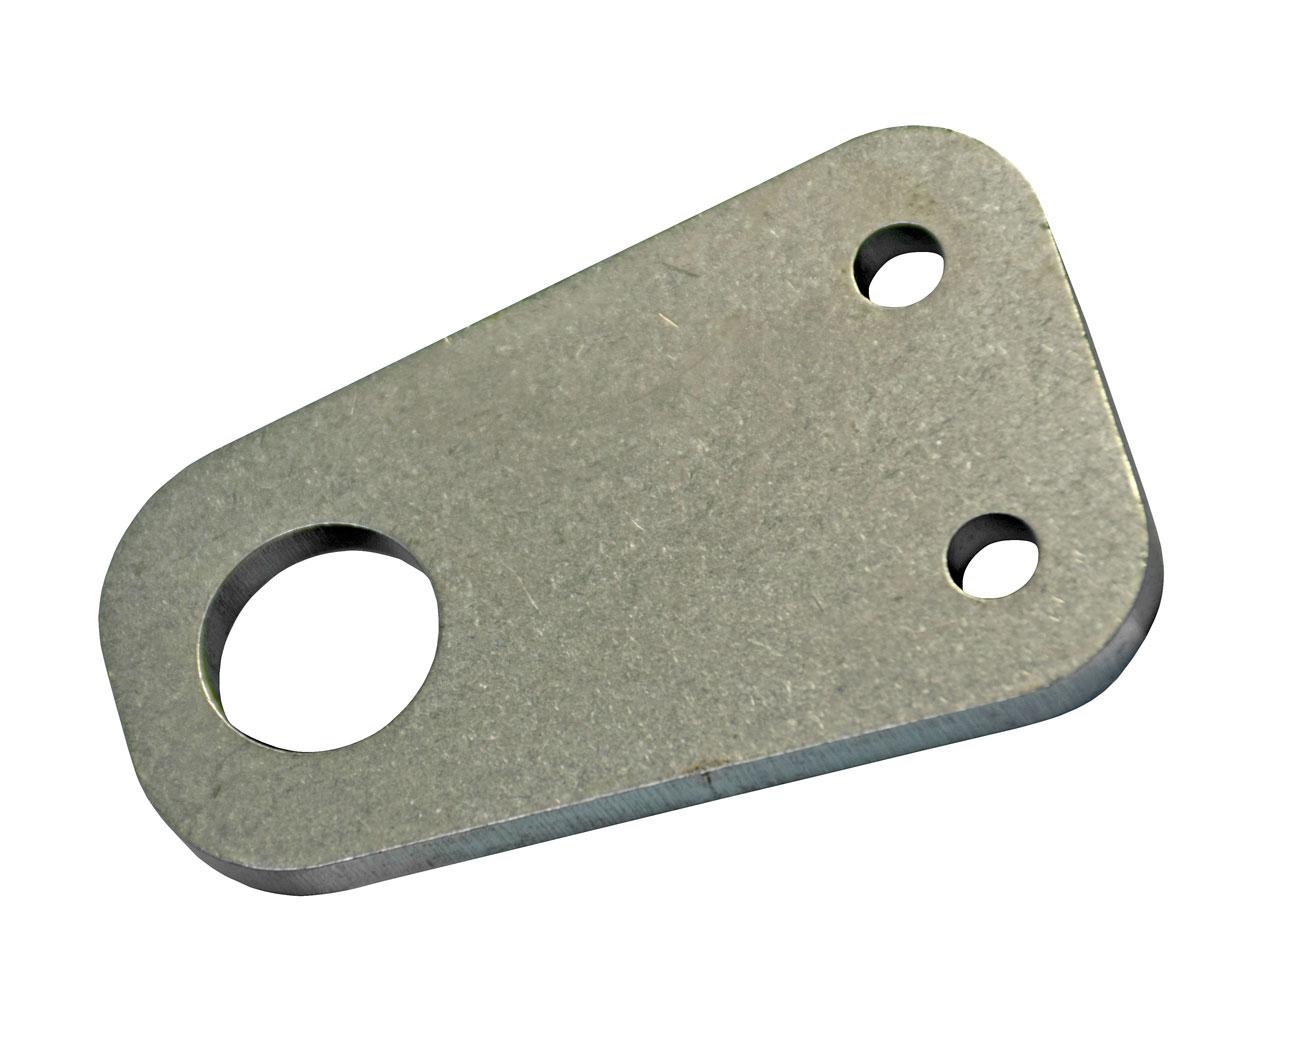 Batsystem Deckbeschlag für ST95/ST125/ST130 - P1043